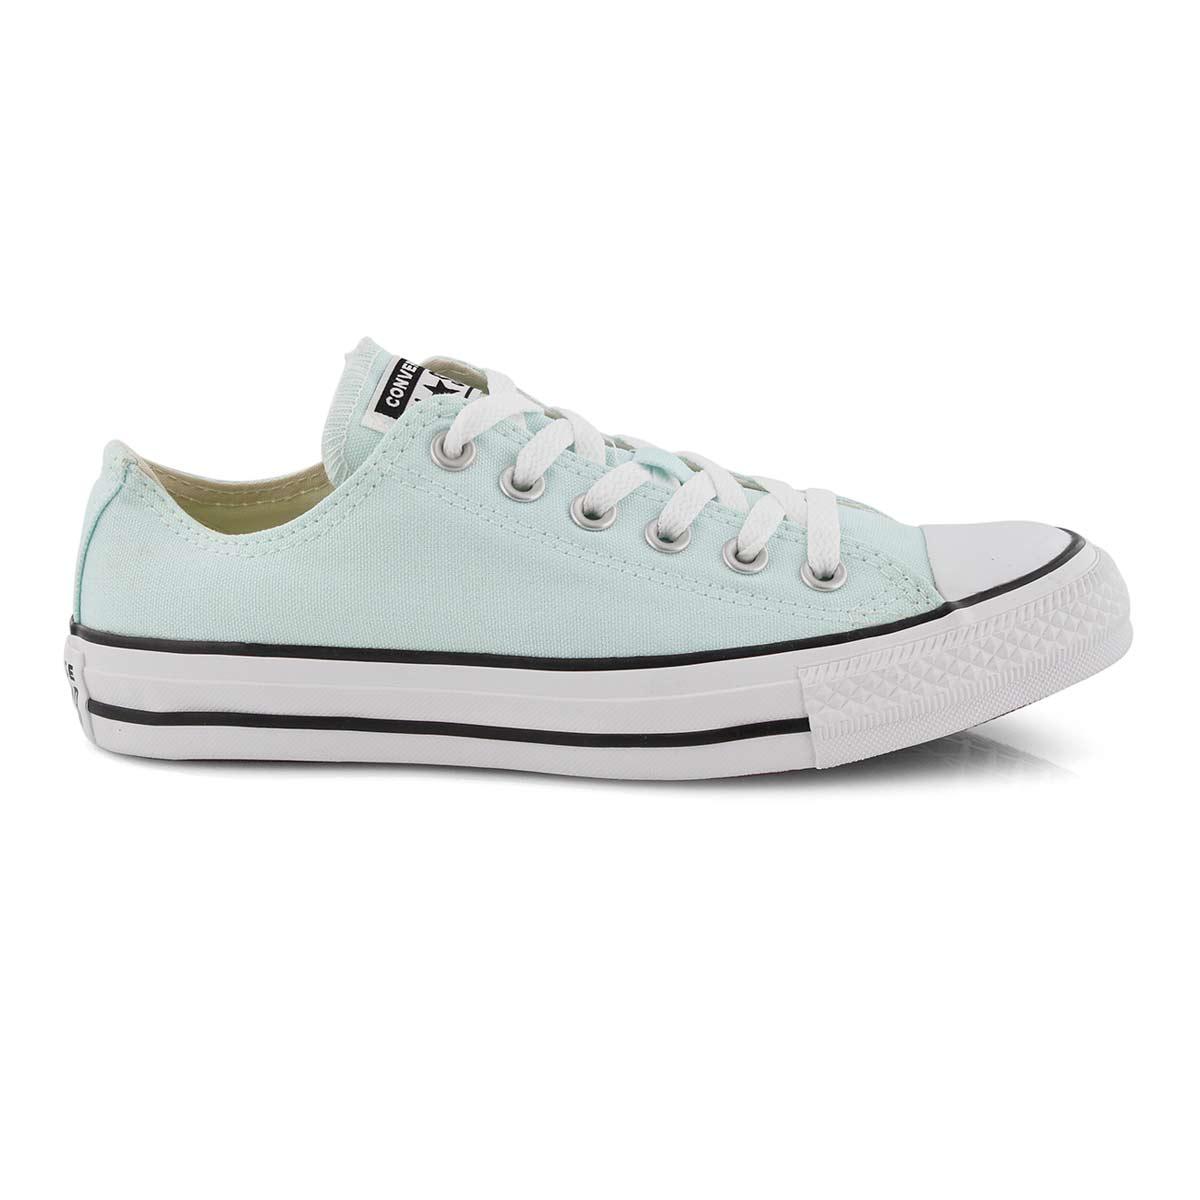 Women's CT ALL STAR SEASONAL OX teal sneakers